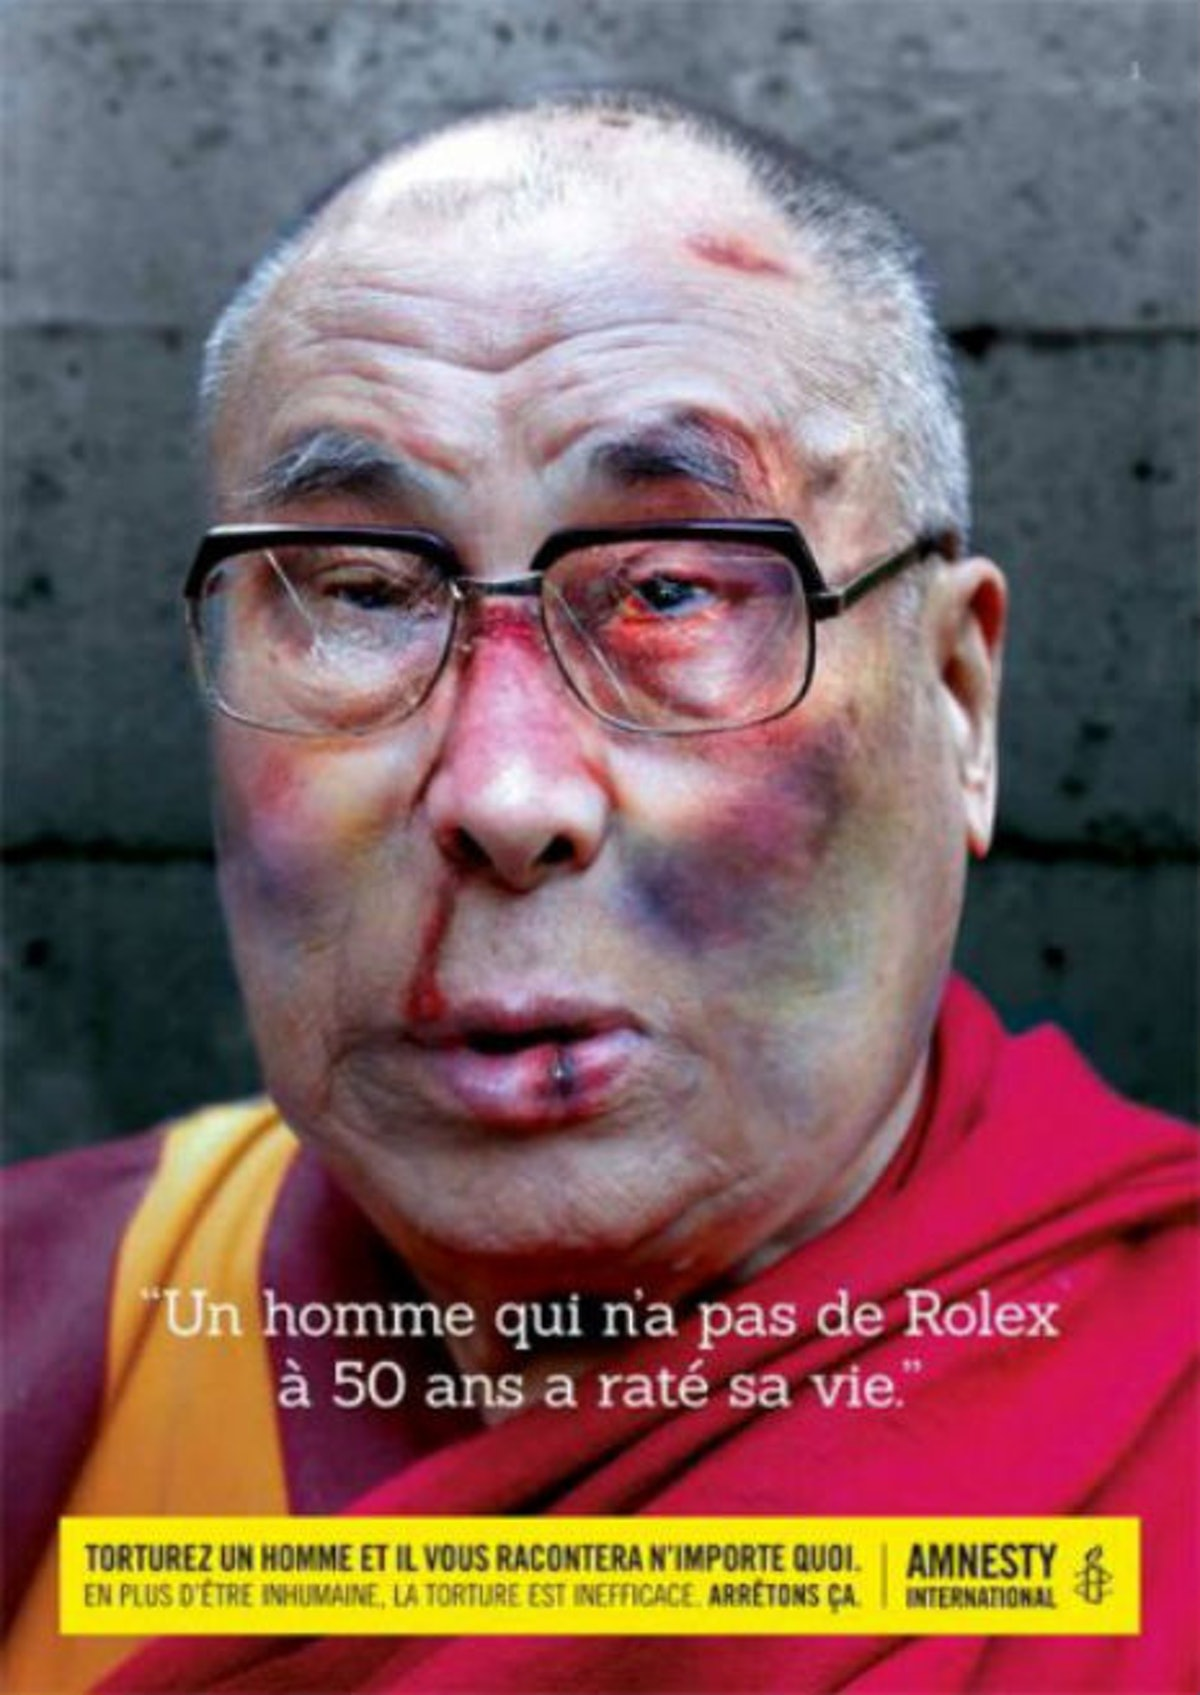 F 35 News >> Dalai Lama, Karl Lagerfeld, and Amnesty International Spotlight Political Torture In New Ad Campaign